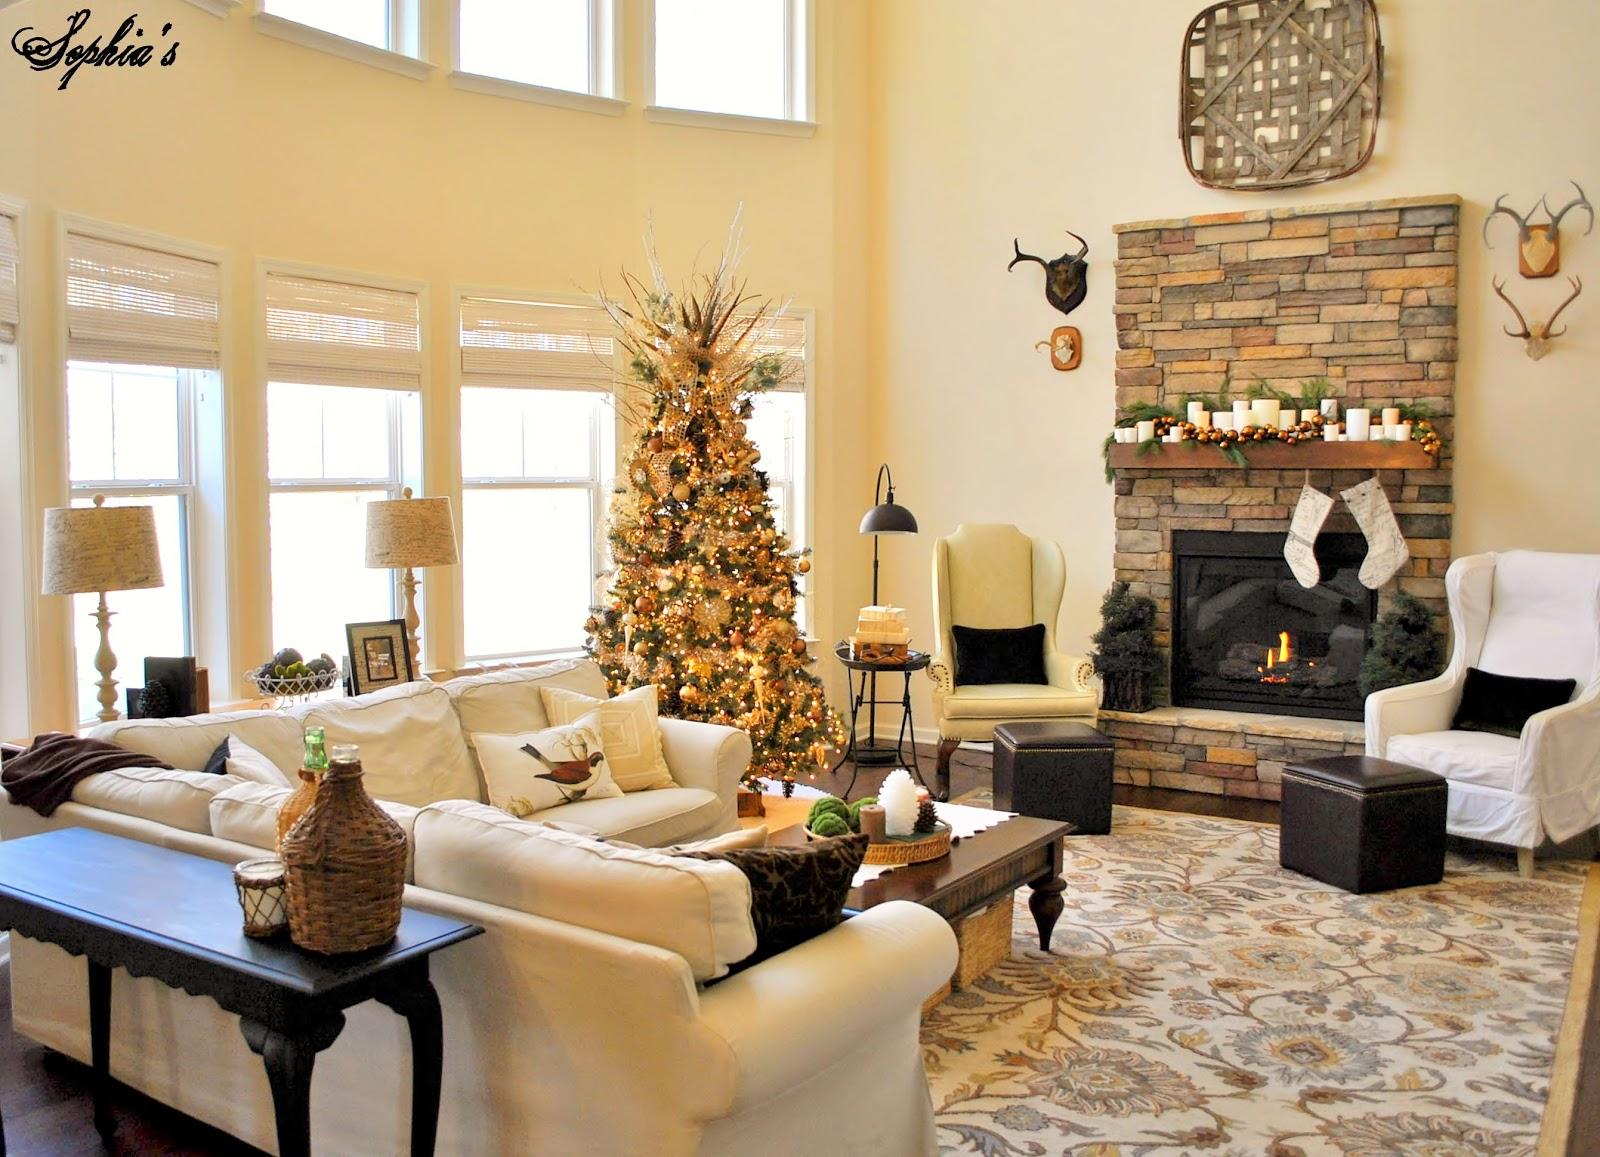 Great Room Ideas: Sophia's: Great Room Rustic Christmas